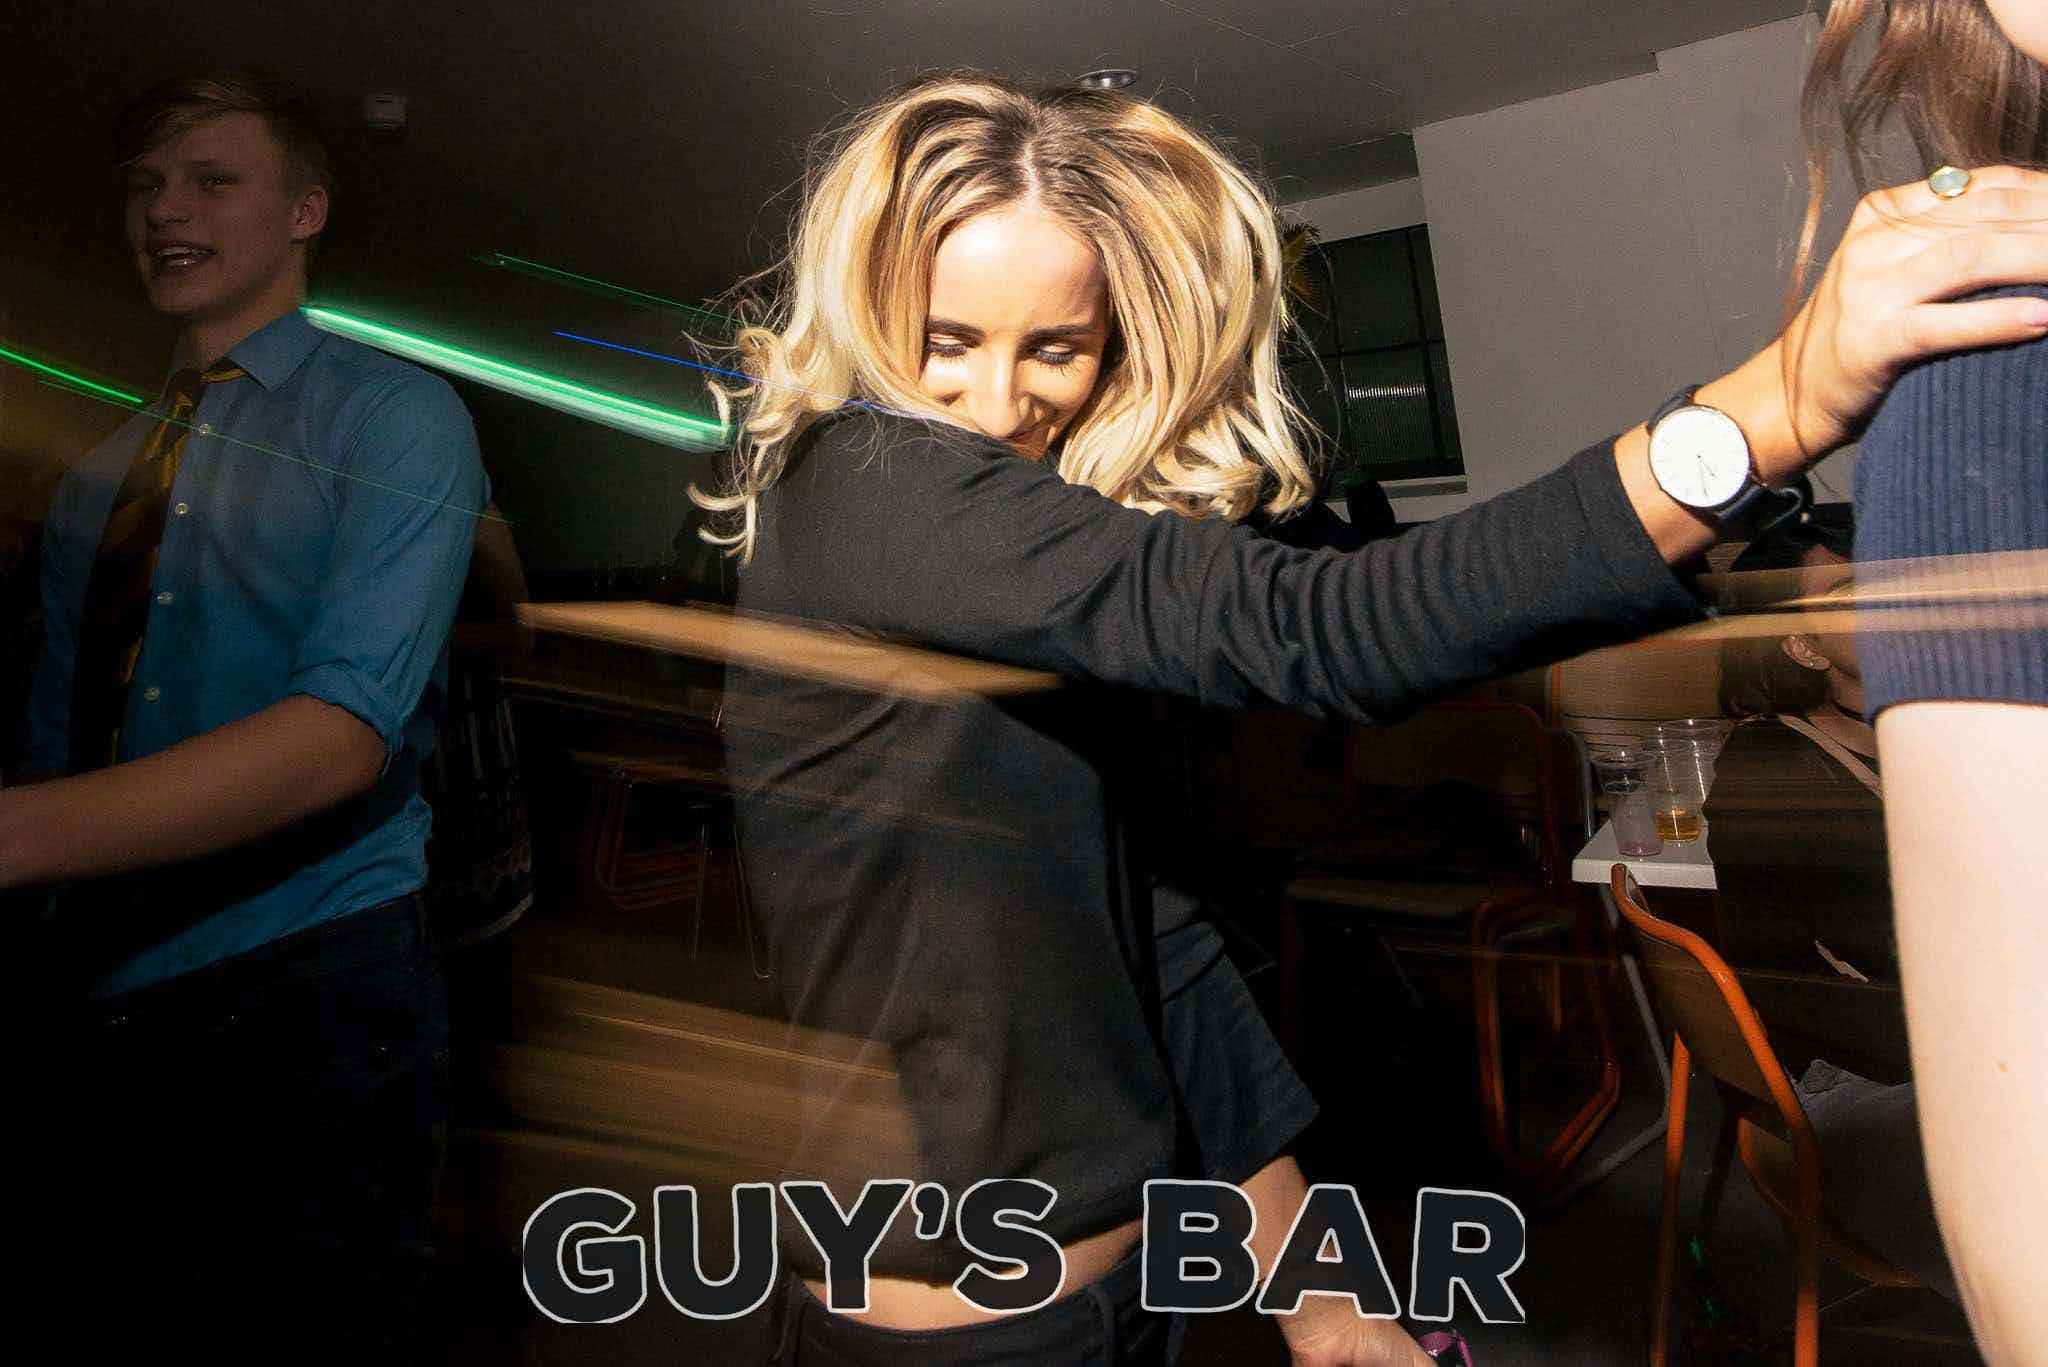 Guy's Bar, The Guy's Bar